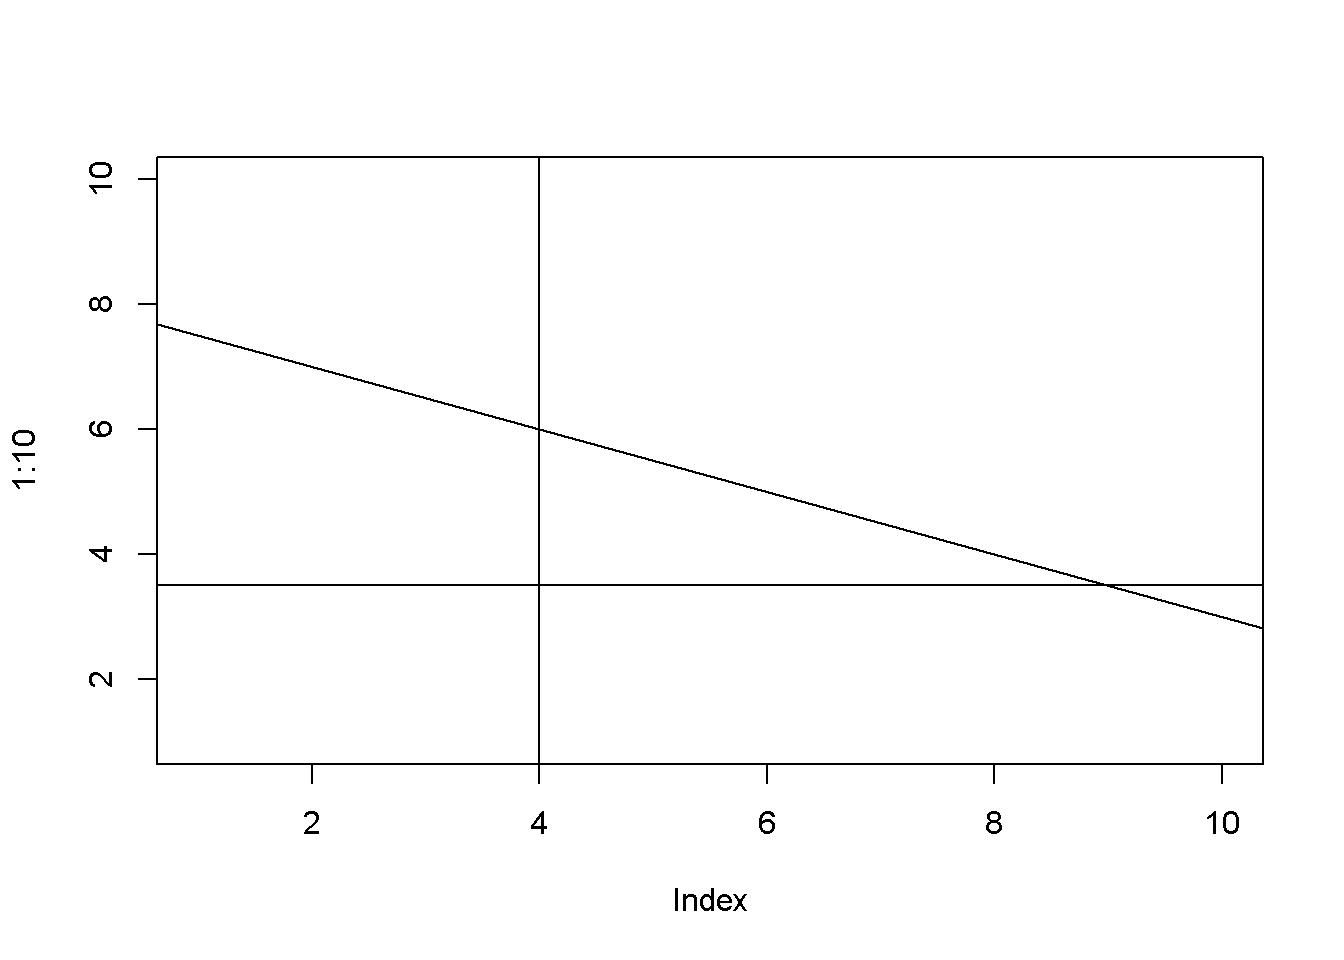 Principles of Econometrics with R